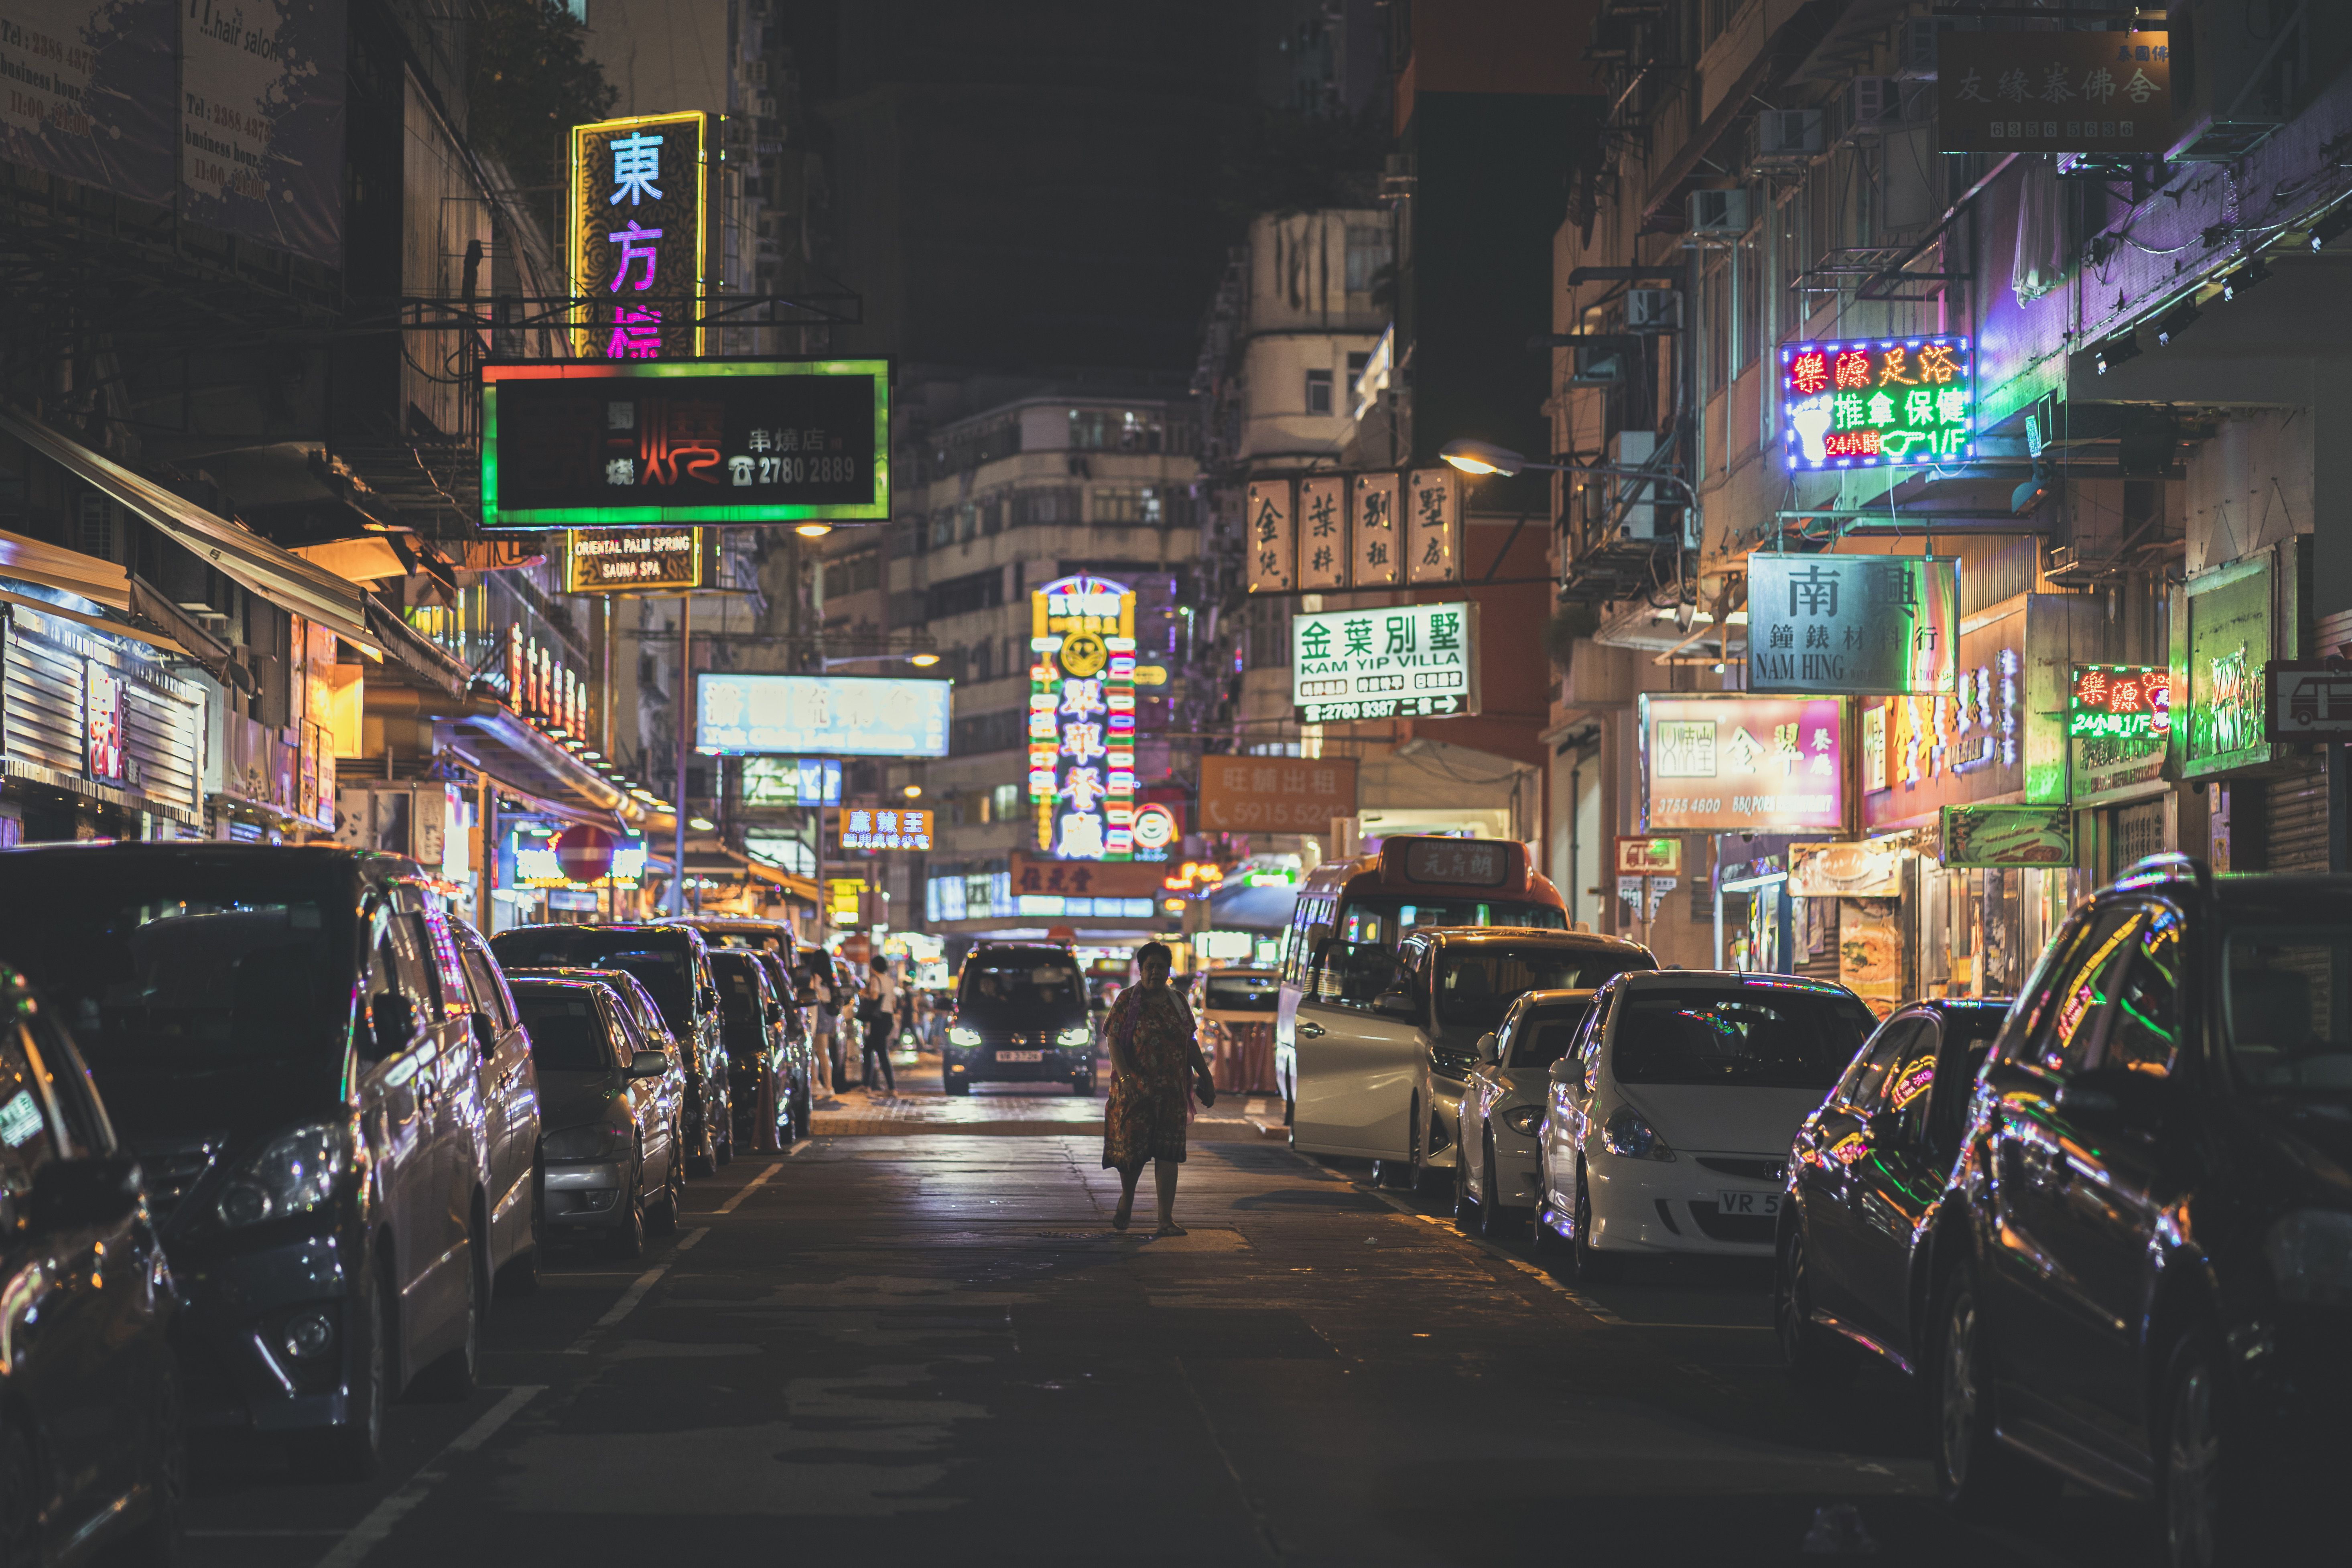 Hong Kong Street Food & Other Hong Kong Cheap Eats ... |Hong Kong Street